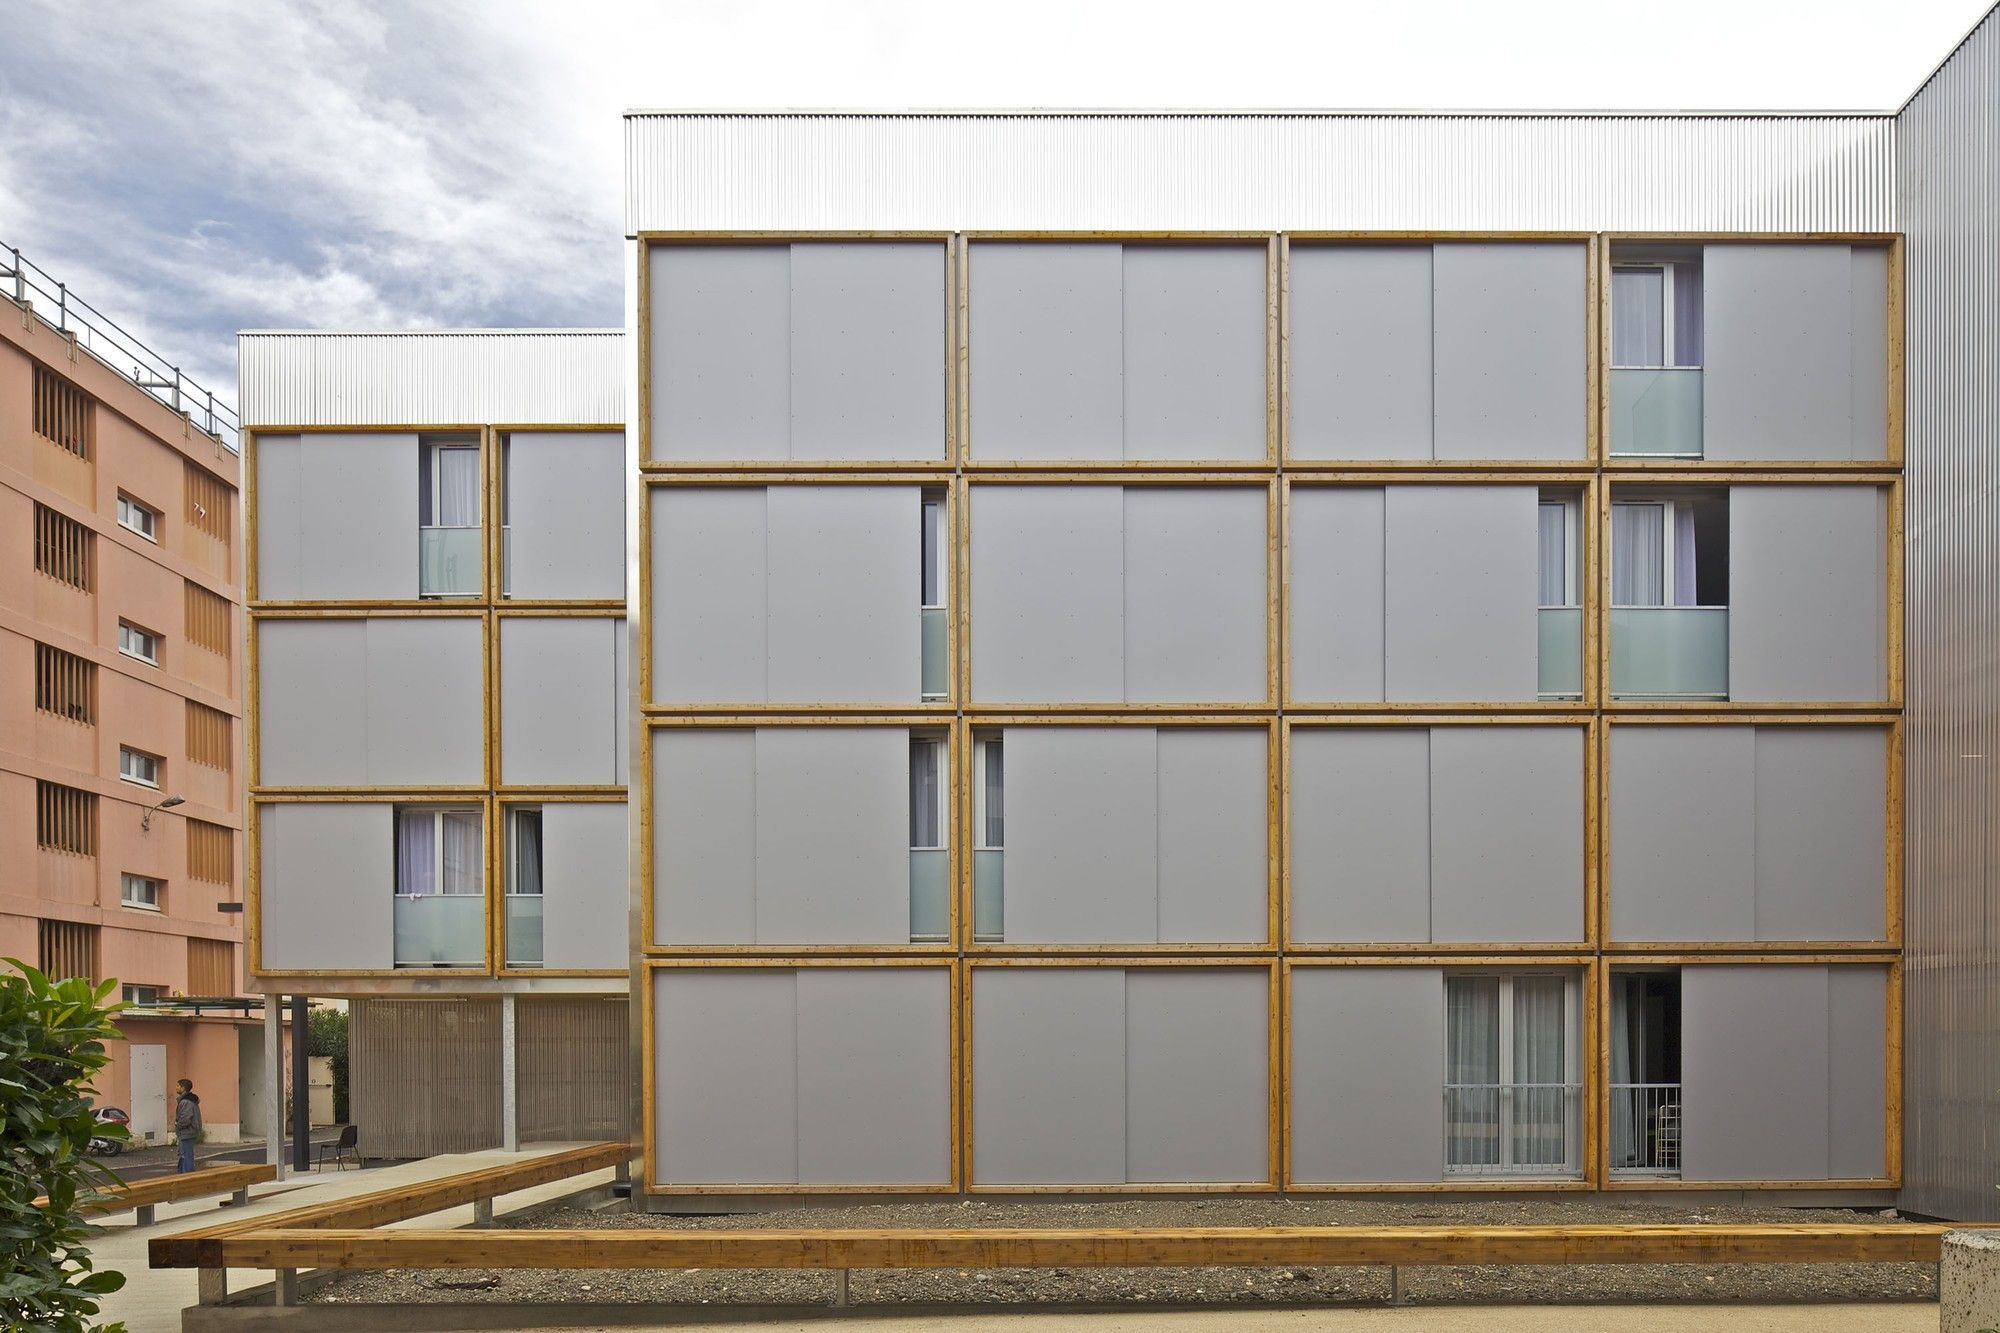 Haus statt Hain Modularer Wohnungsbau in Toulouse